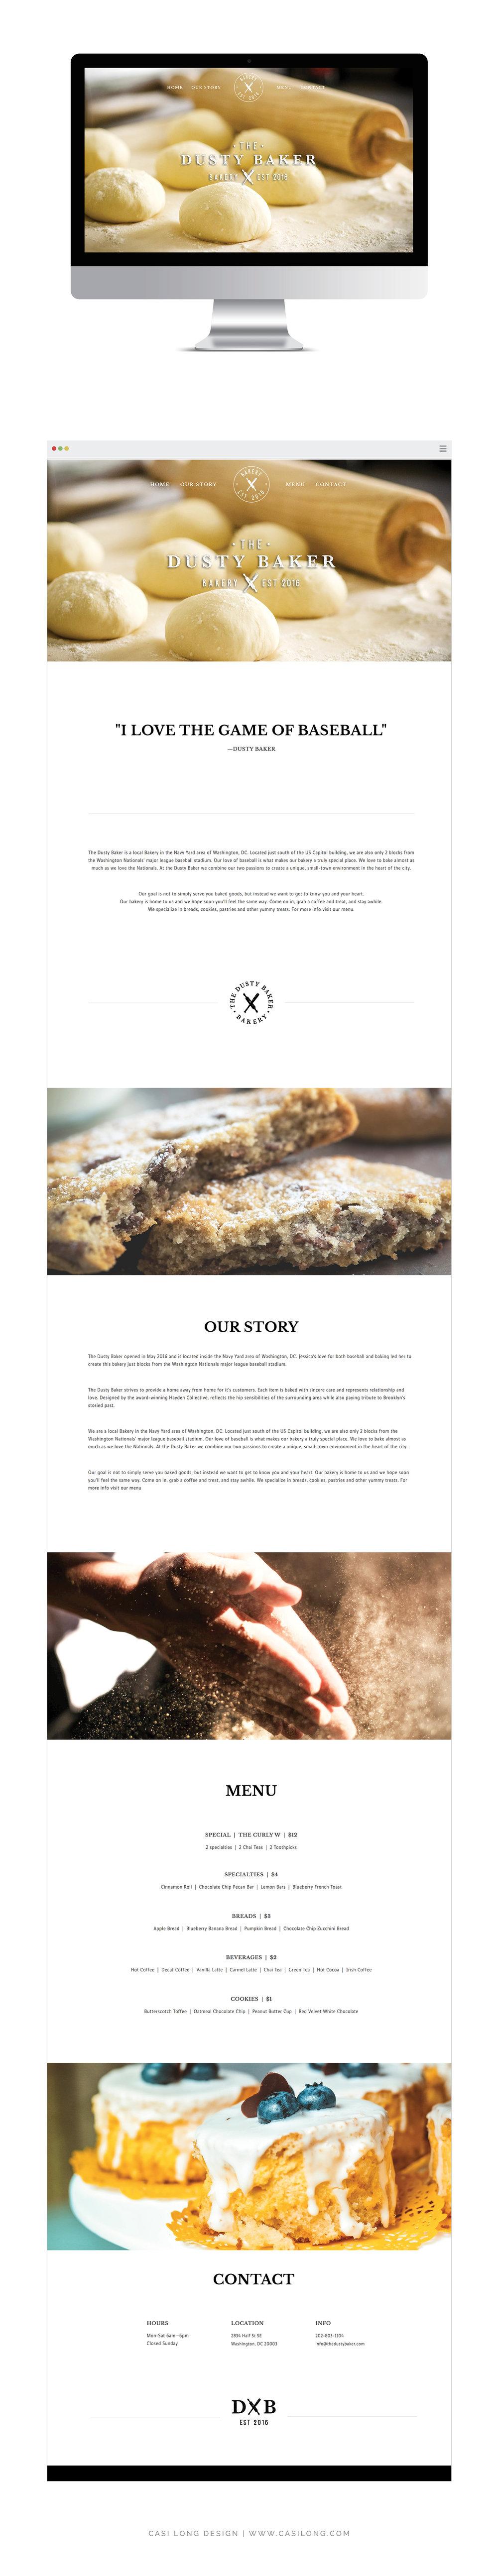 Website Design | Squarespace | Brand + Website Design by Casi Long Design | The Dusty Baker Bakery | casilong.com #casilongdesign #fearlesspursuit